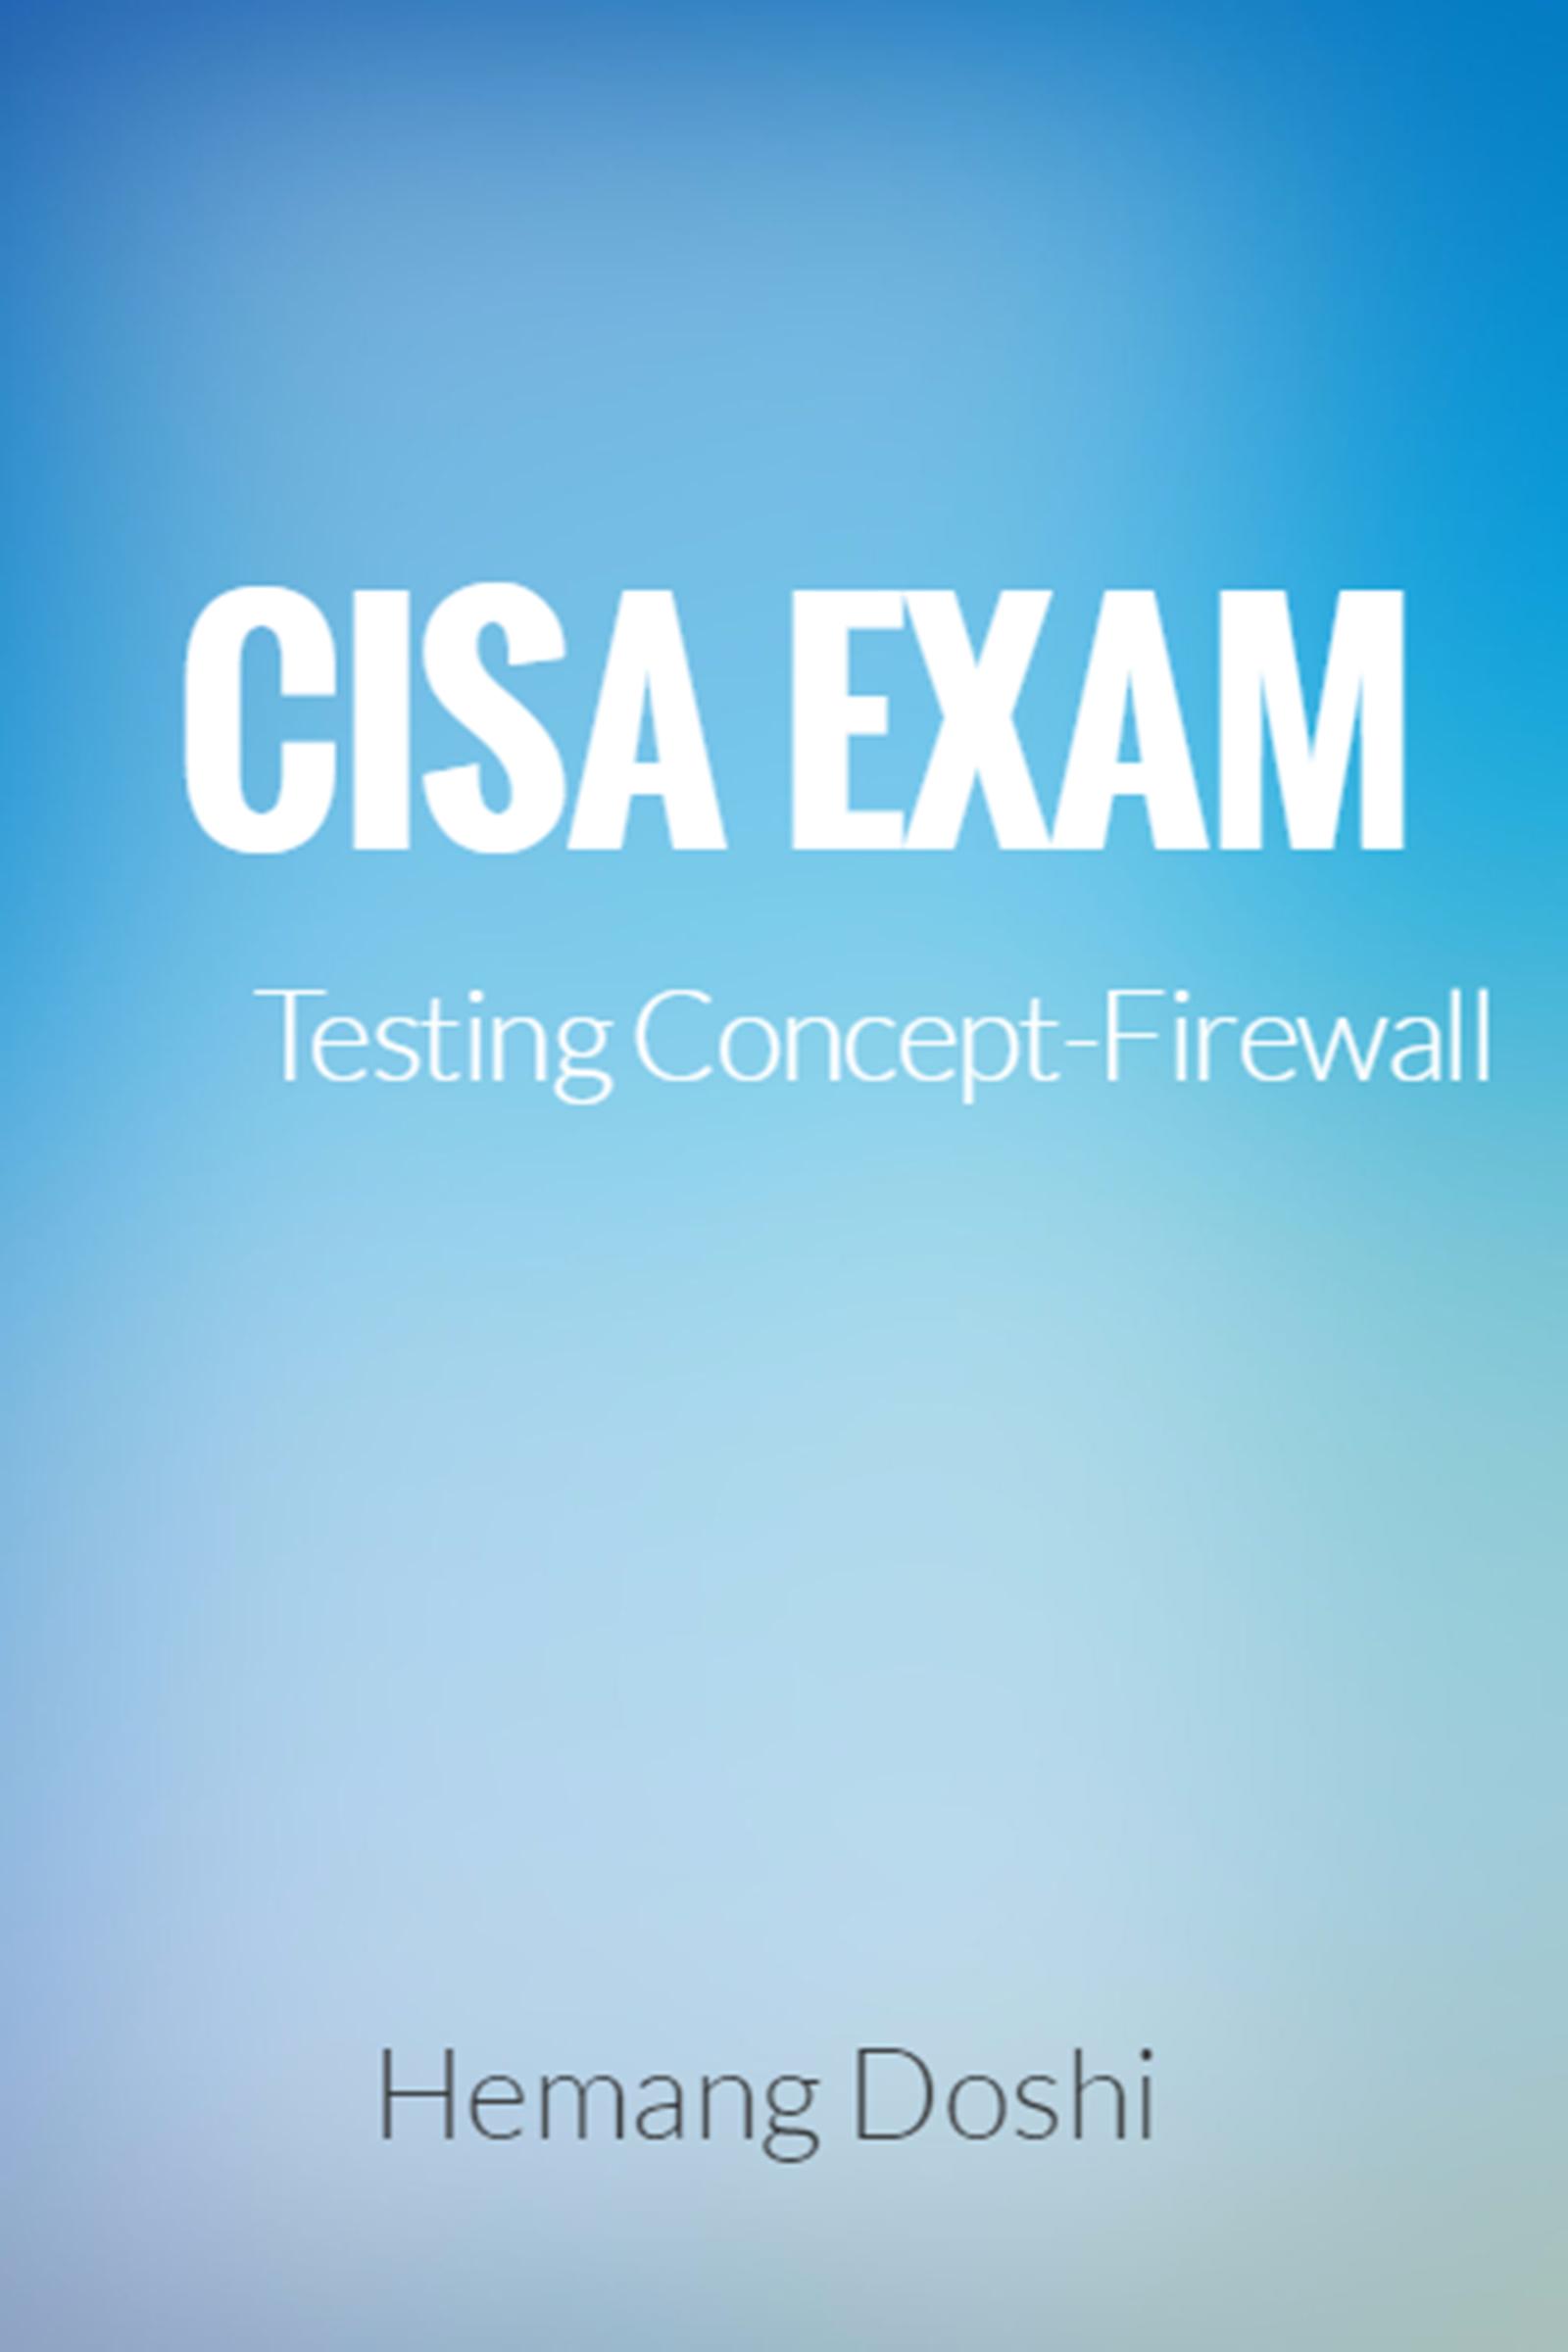 CISA EXAM-Testing Concept-Firewall, an Ebook by Hemang Doshi